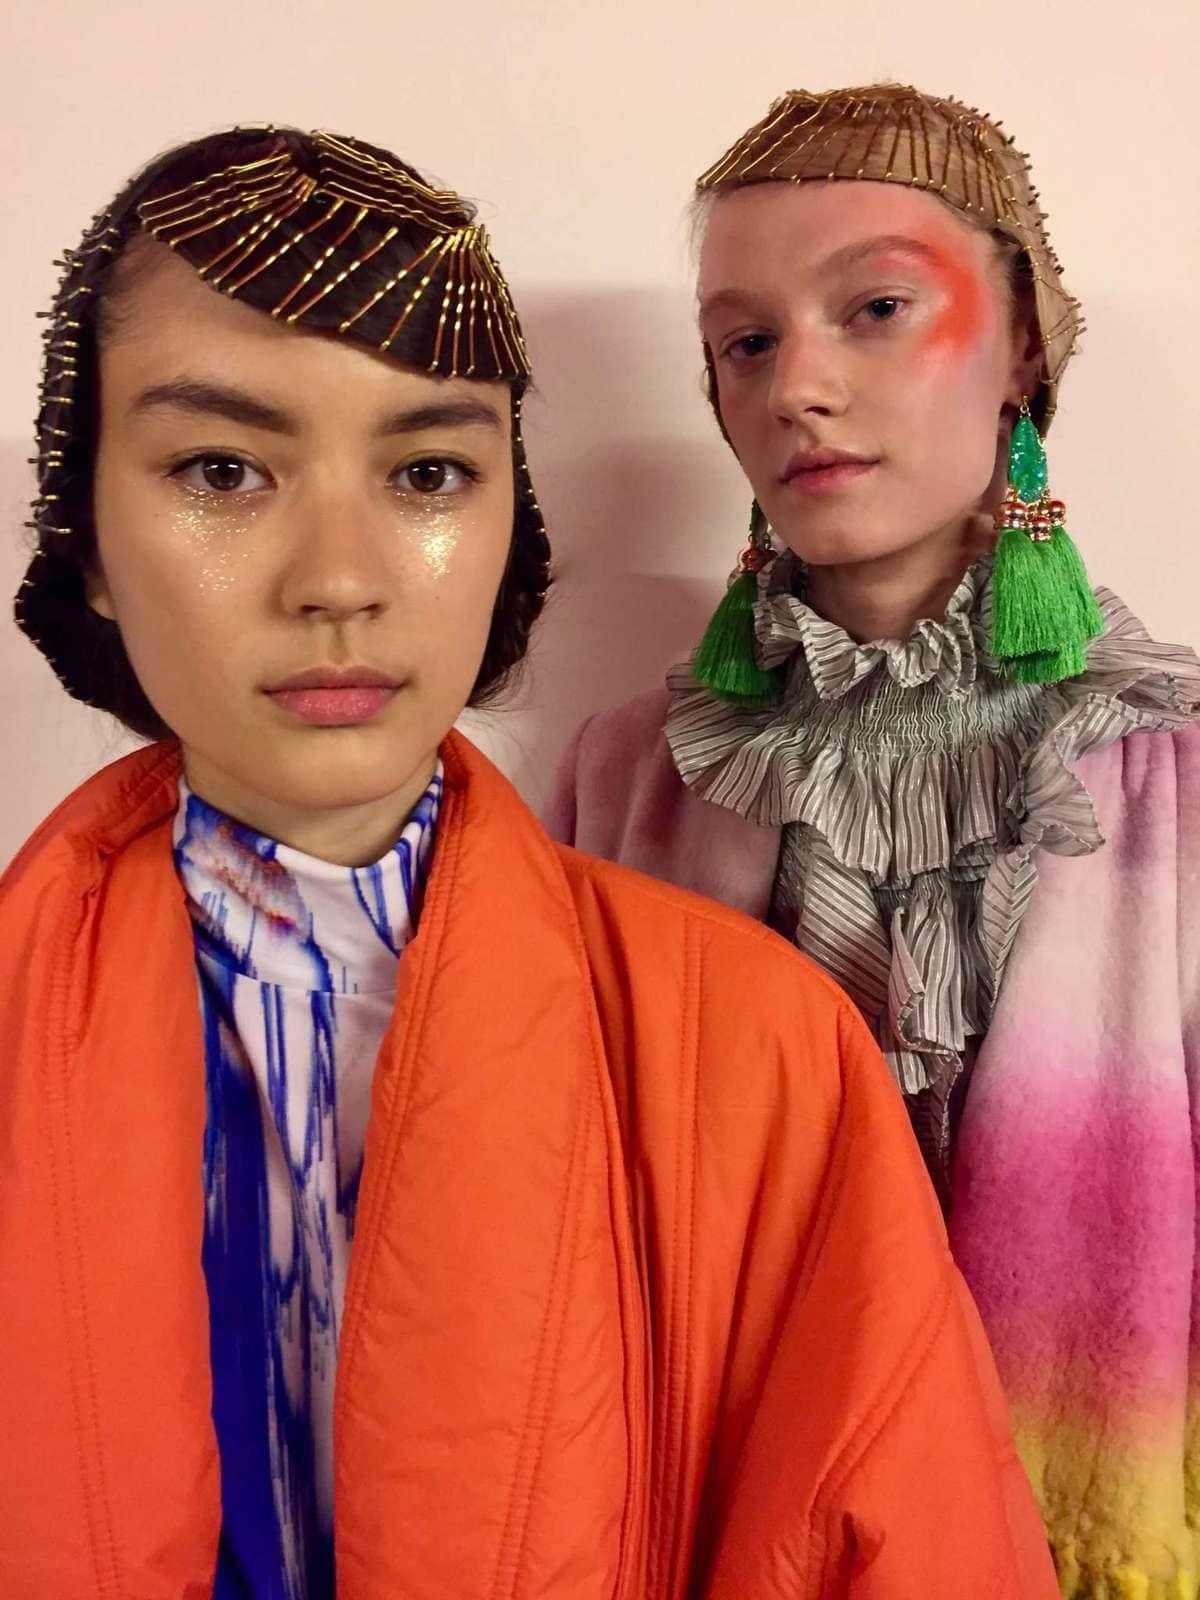 Skørt og smukt, Sine Ginsborg Hair & Make-Up School,